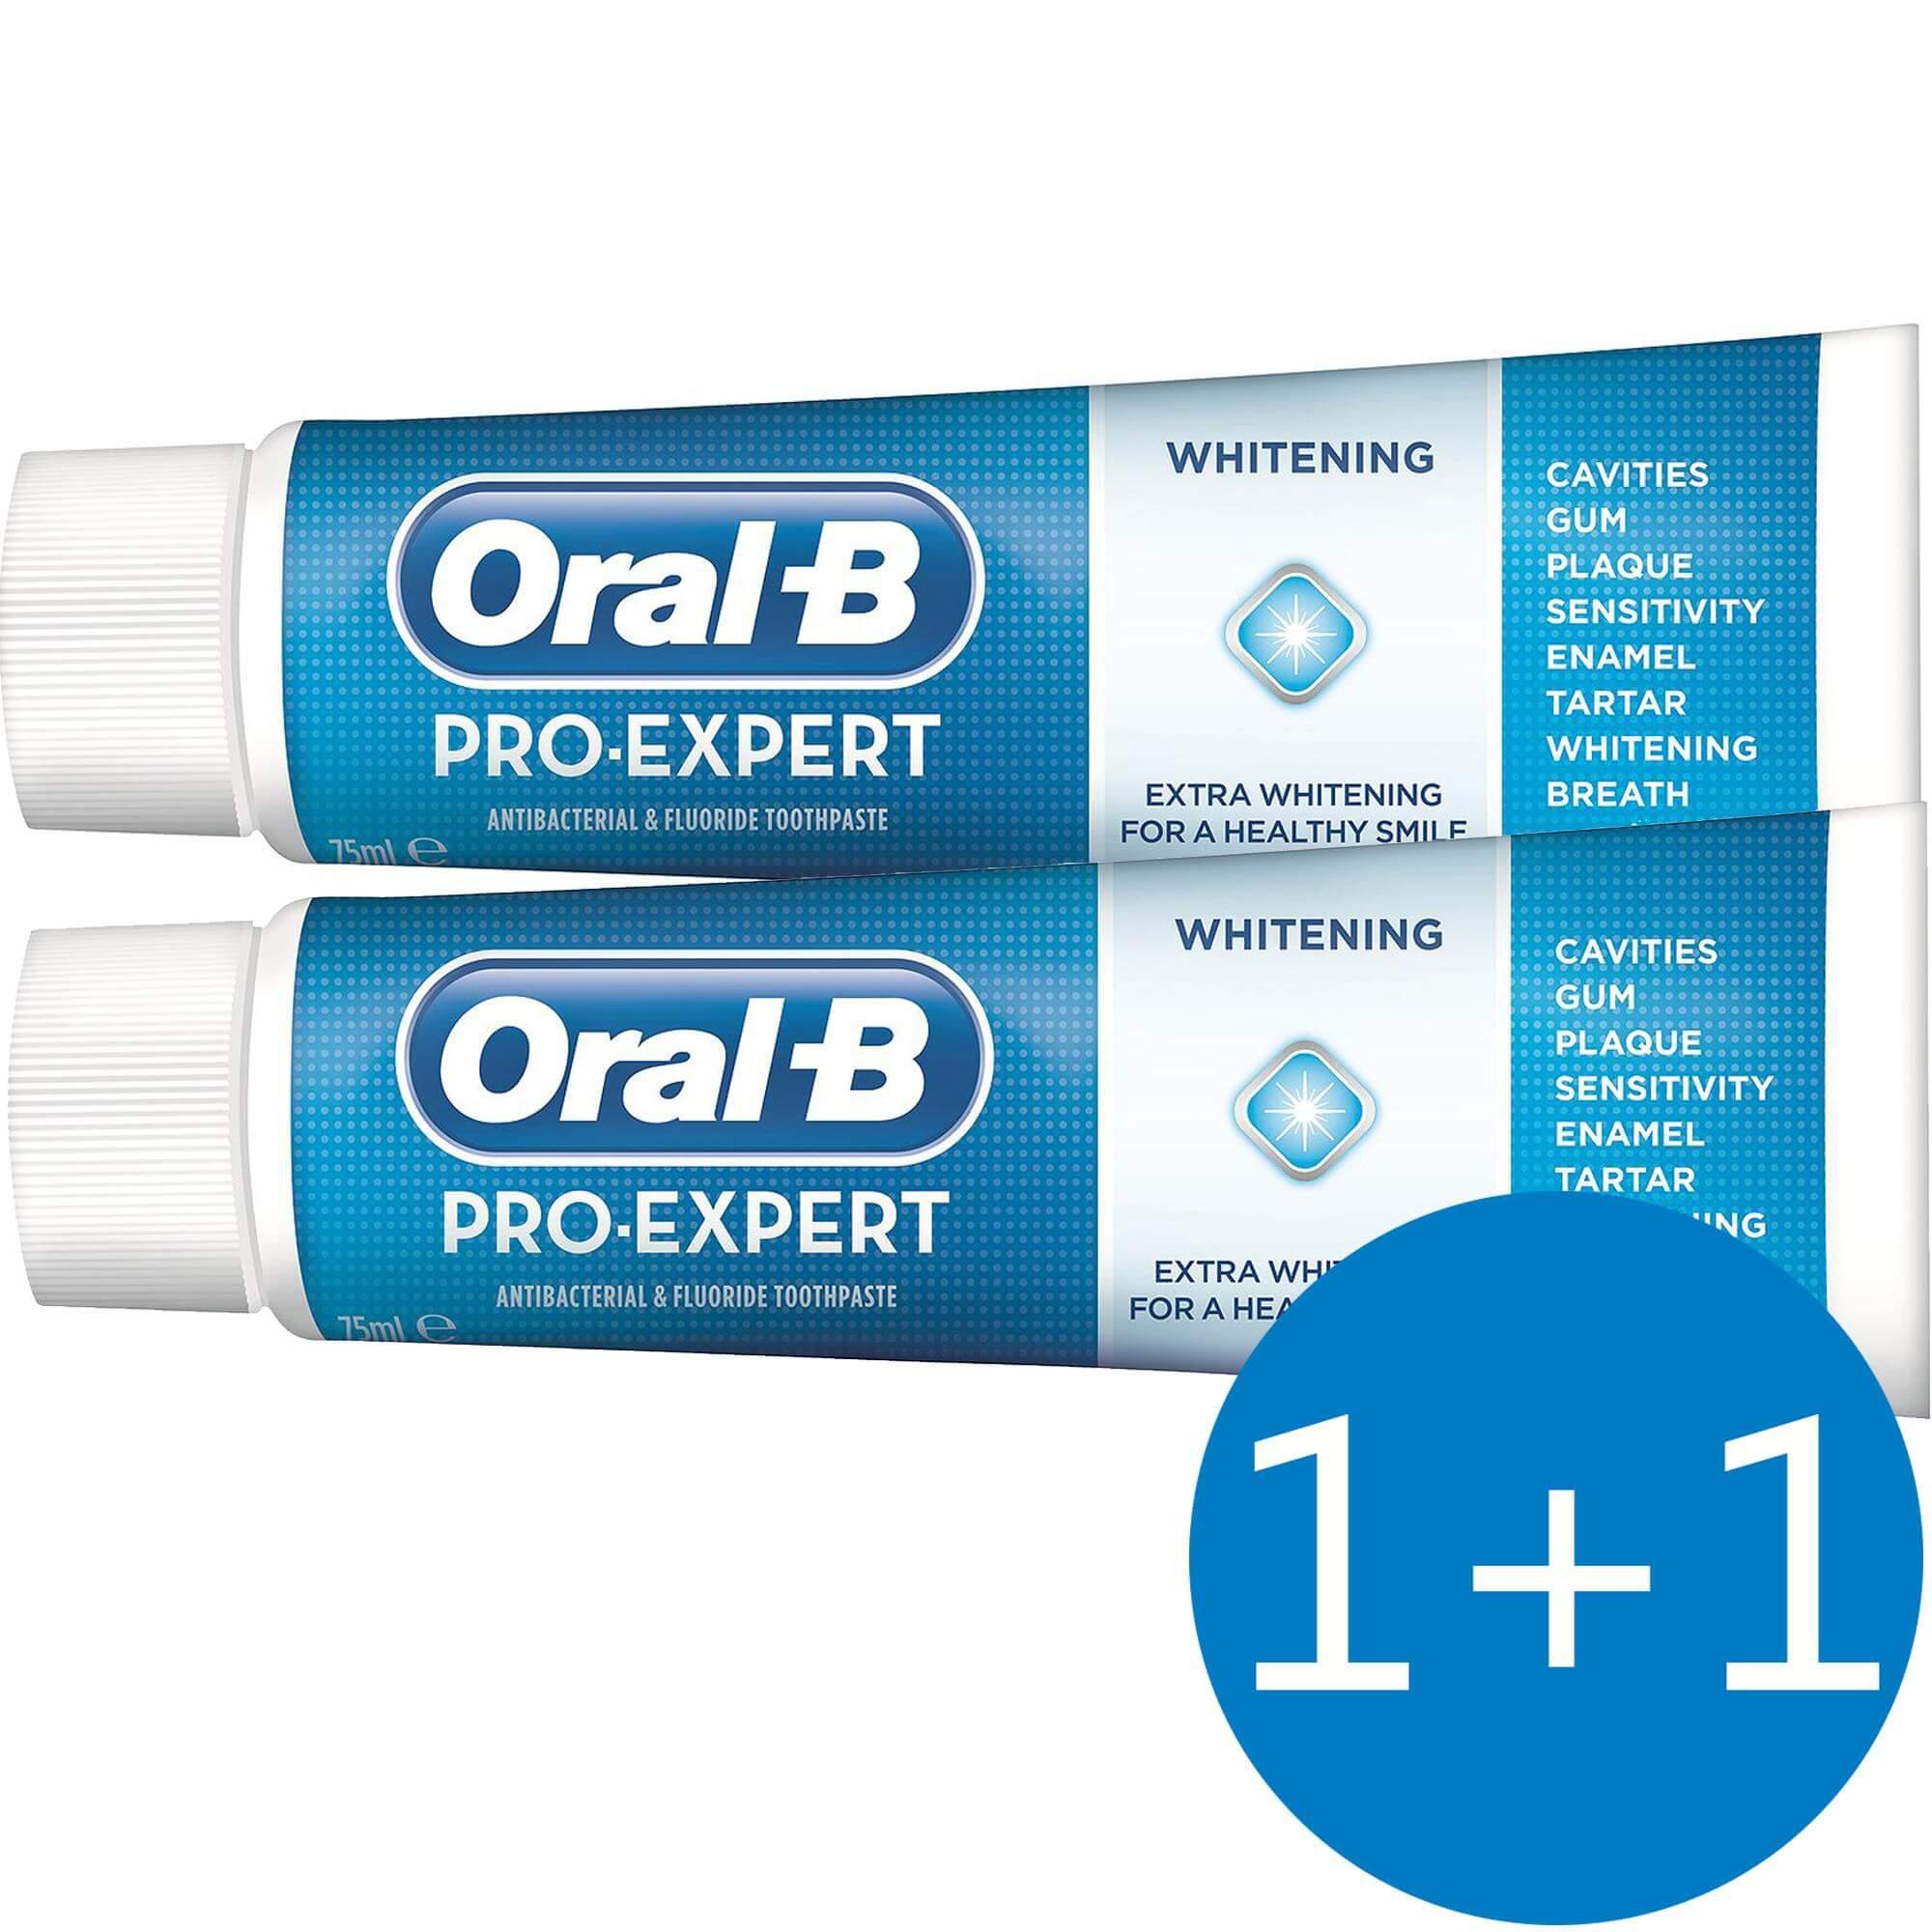 Oral B Πακέτο Προσφοράς Pro Expert Healty White Οδοντόκρεμα Έξτρα Λεύκανσης για Υγιές Χαμόγελο 75ml Προσφορά 1+1 Δώρο